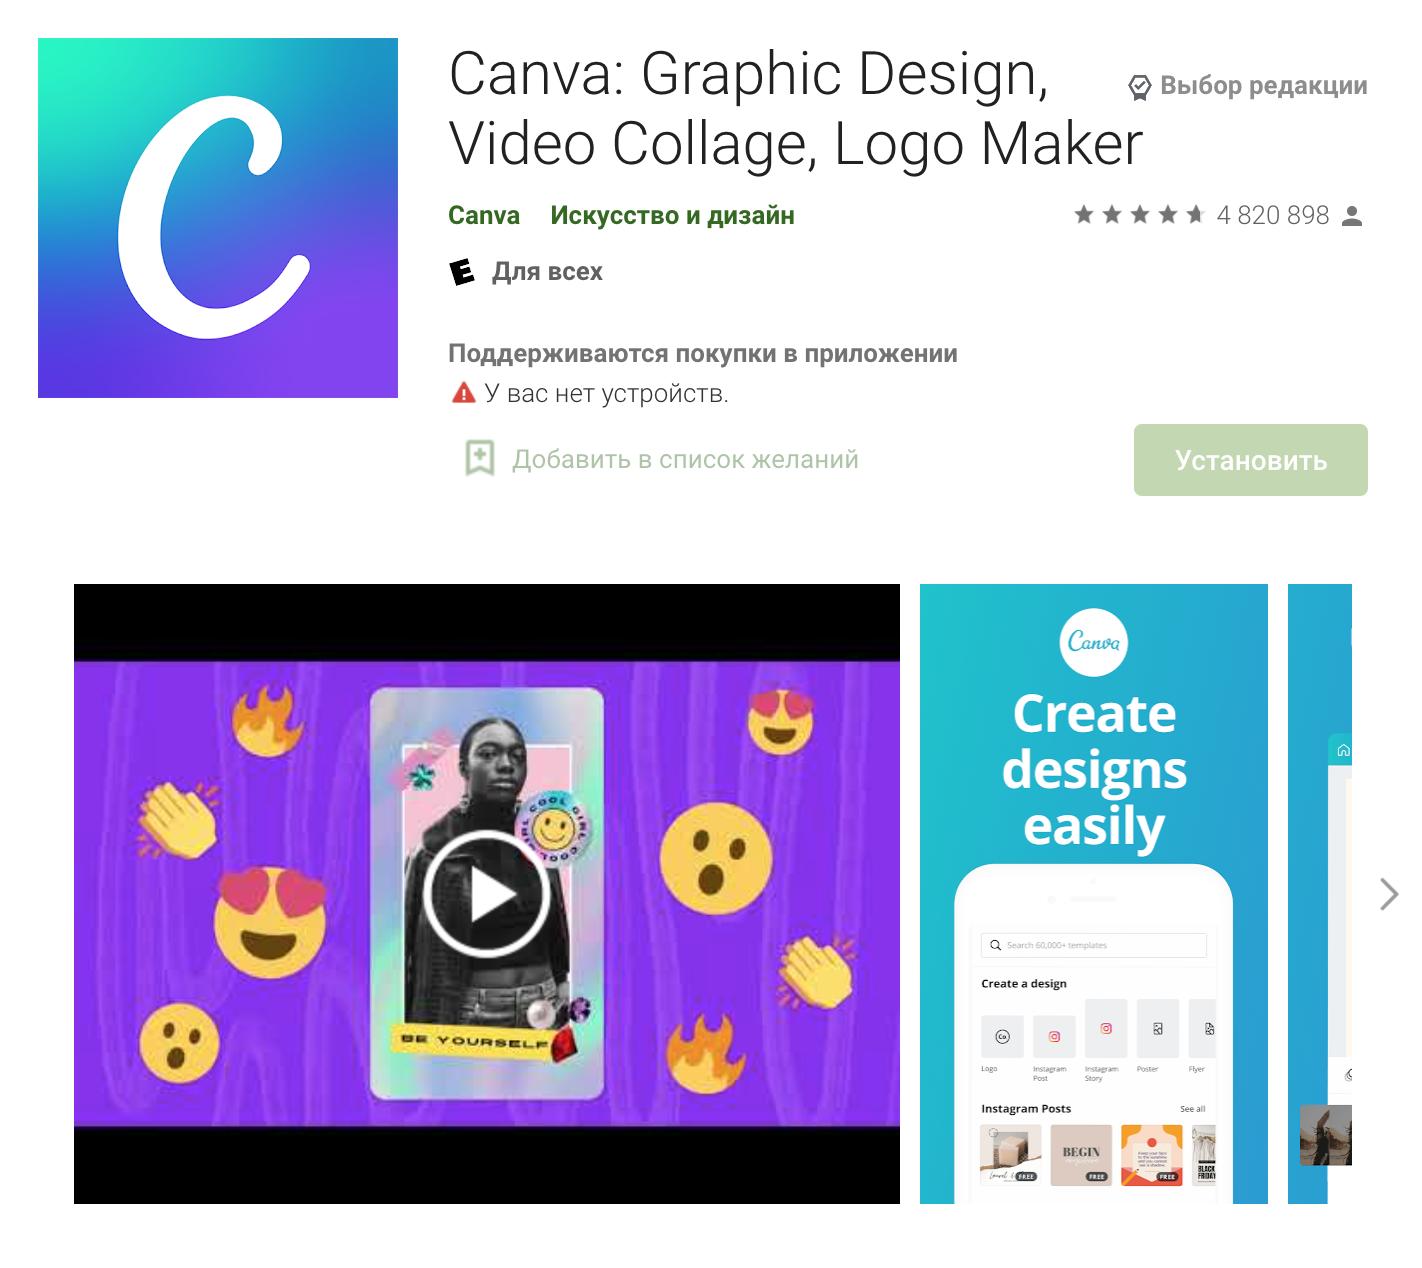 Canva-mobile app